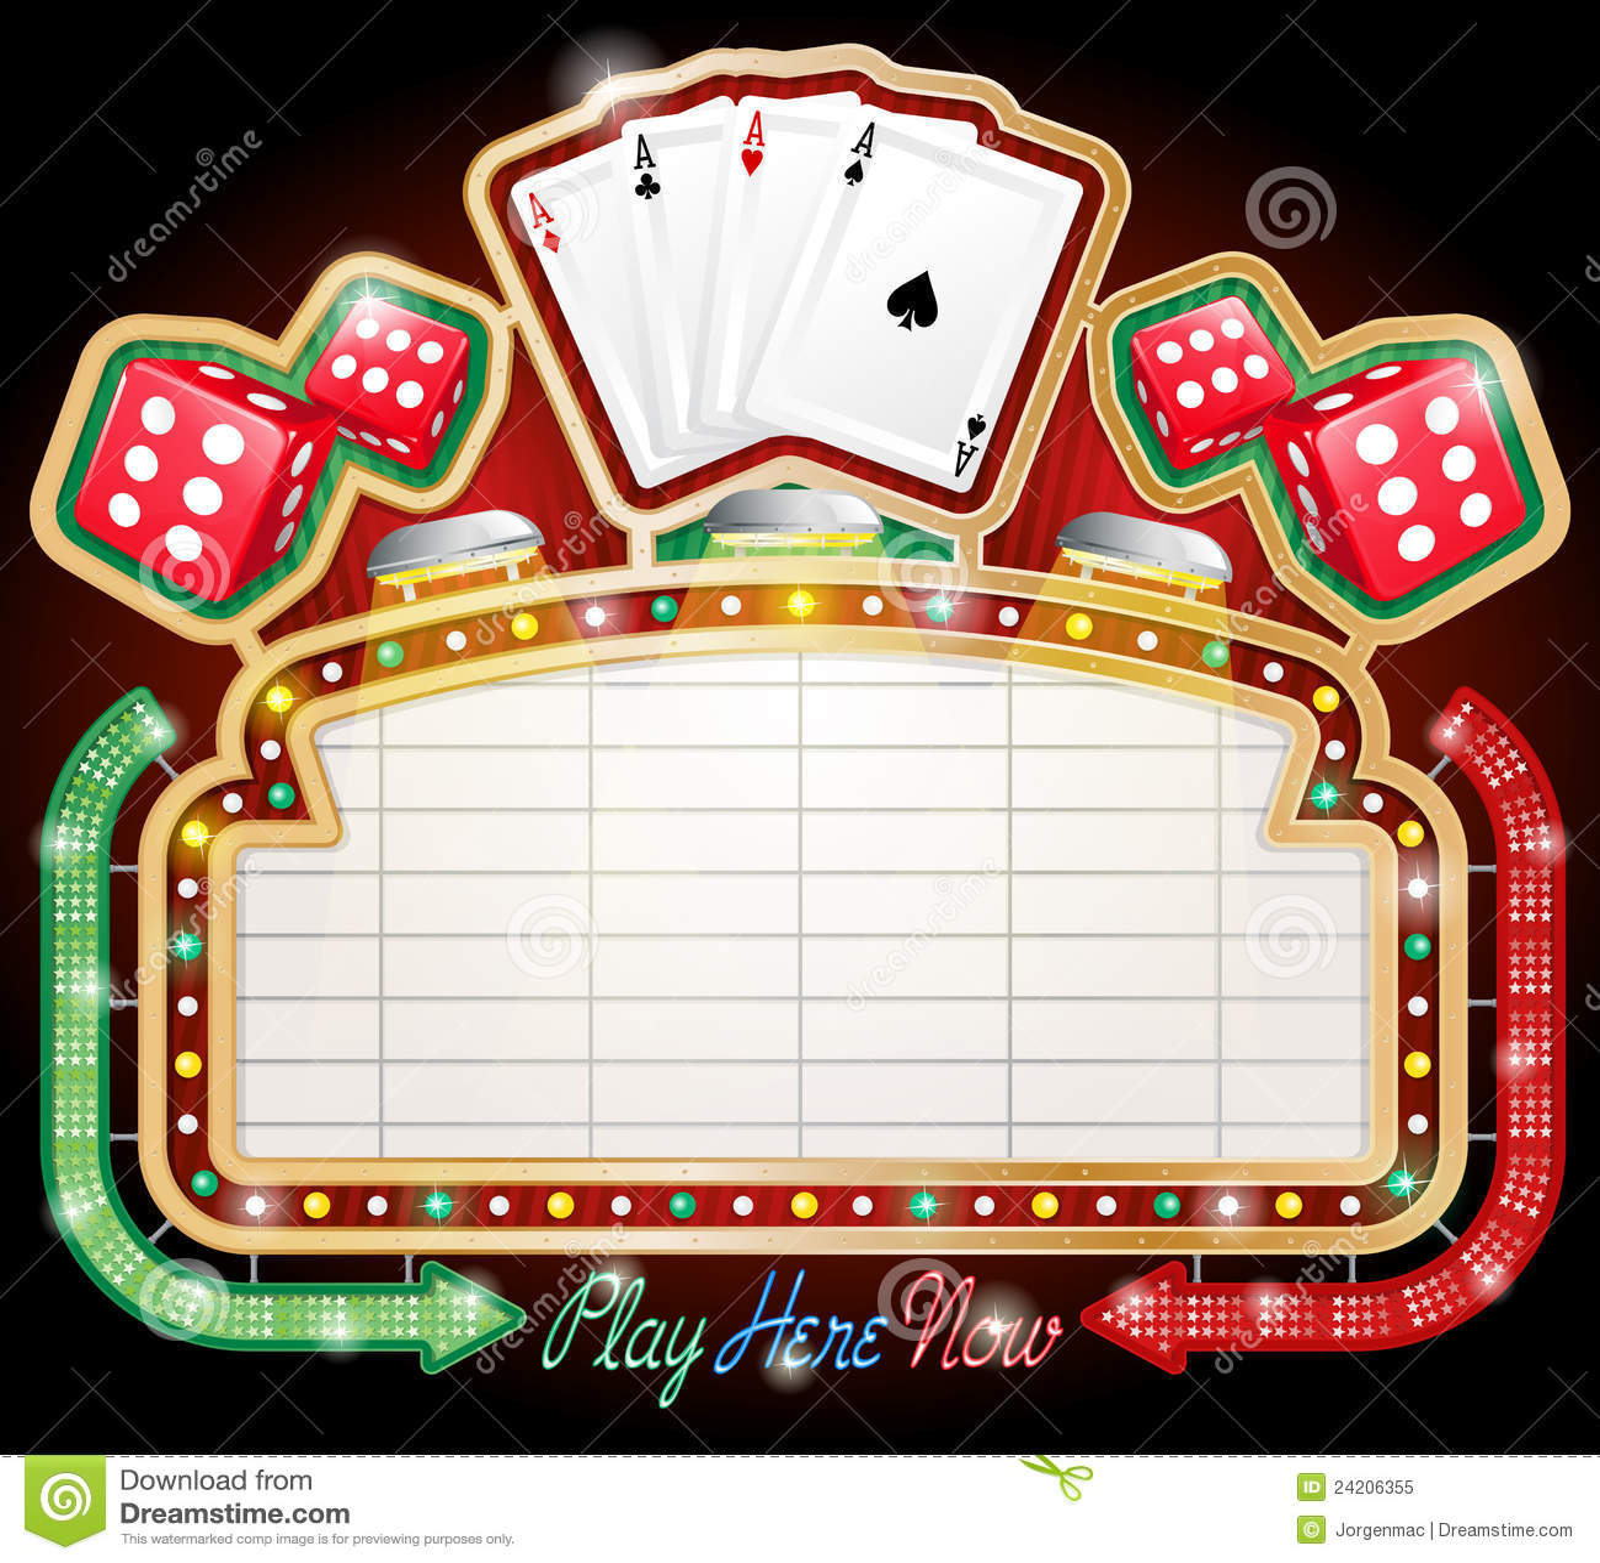 Casino Royale Invitation with luxury invitation example